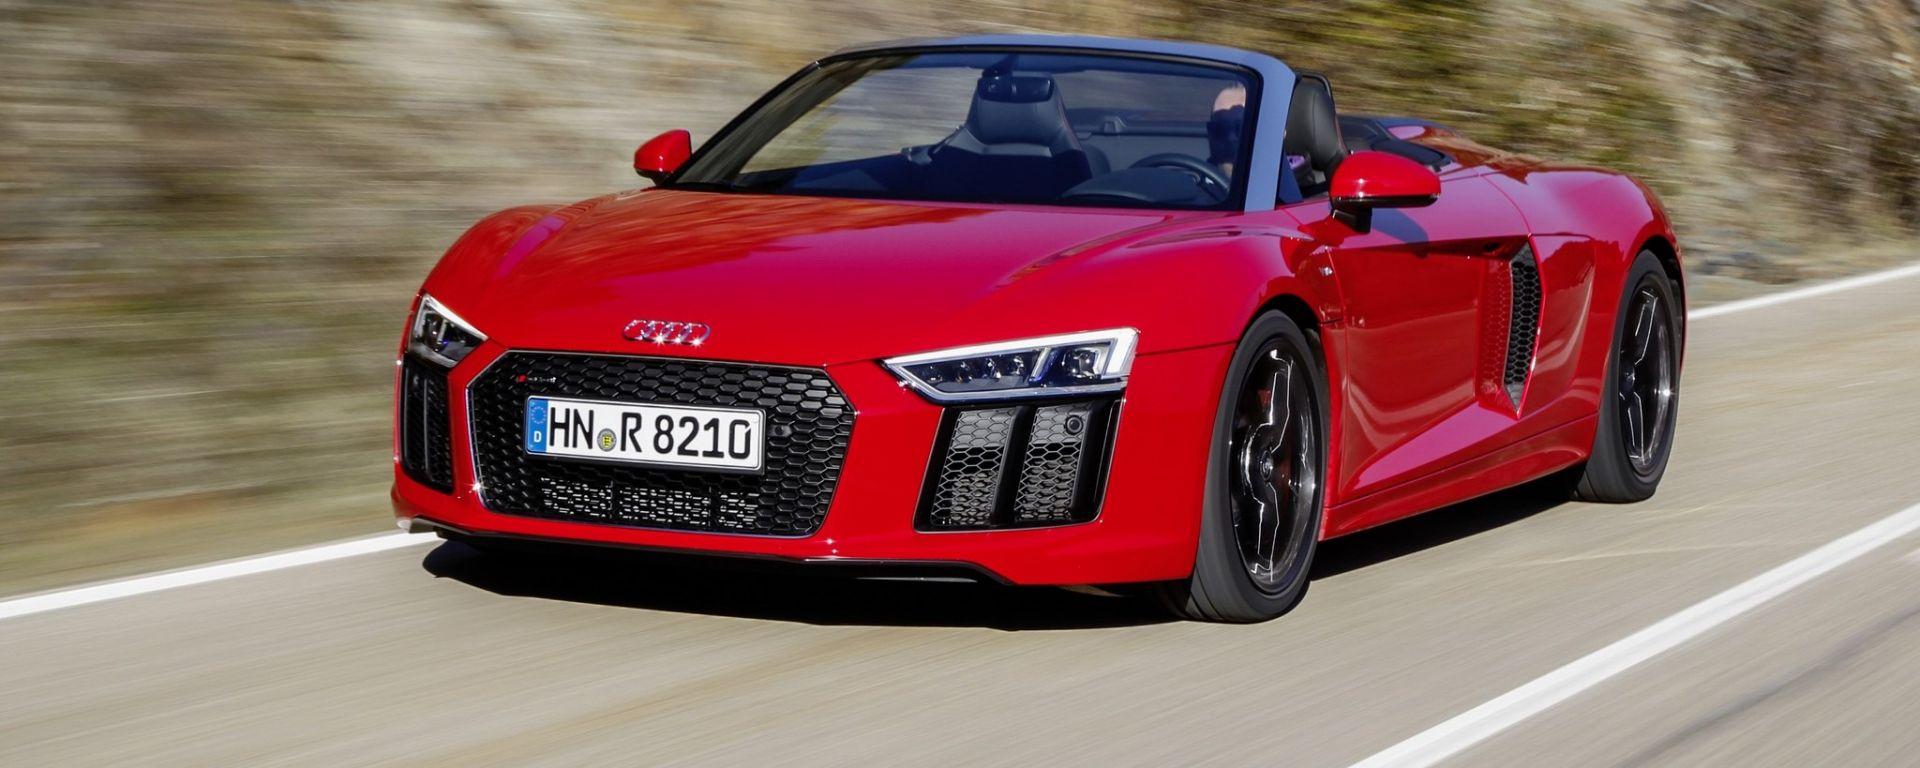 Audi R8 V10 RWS - la versione Spyder